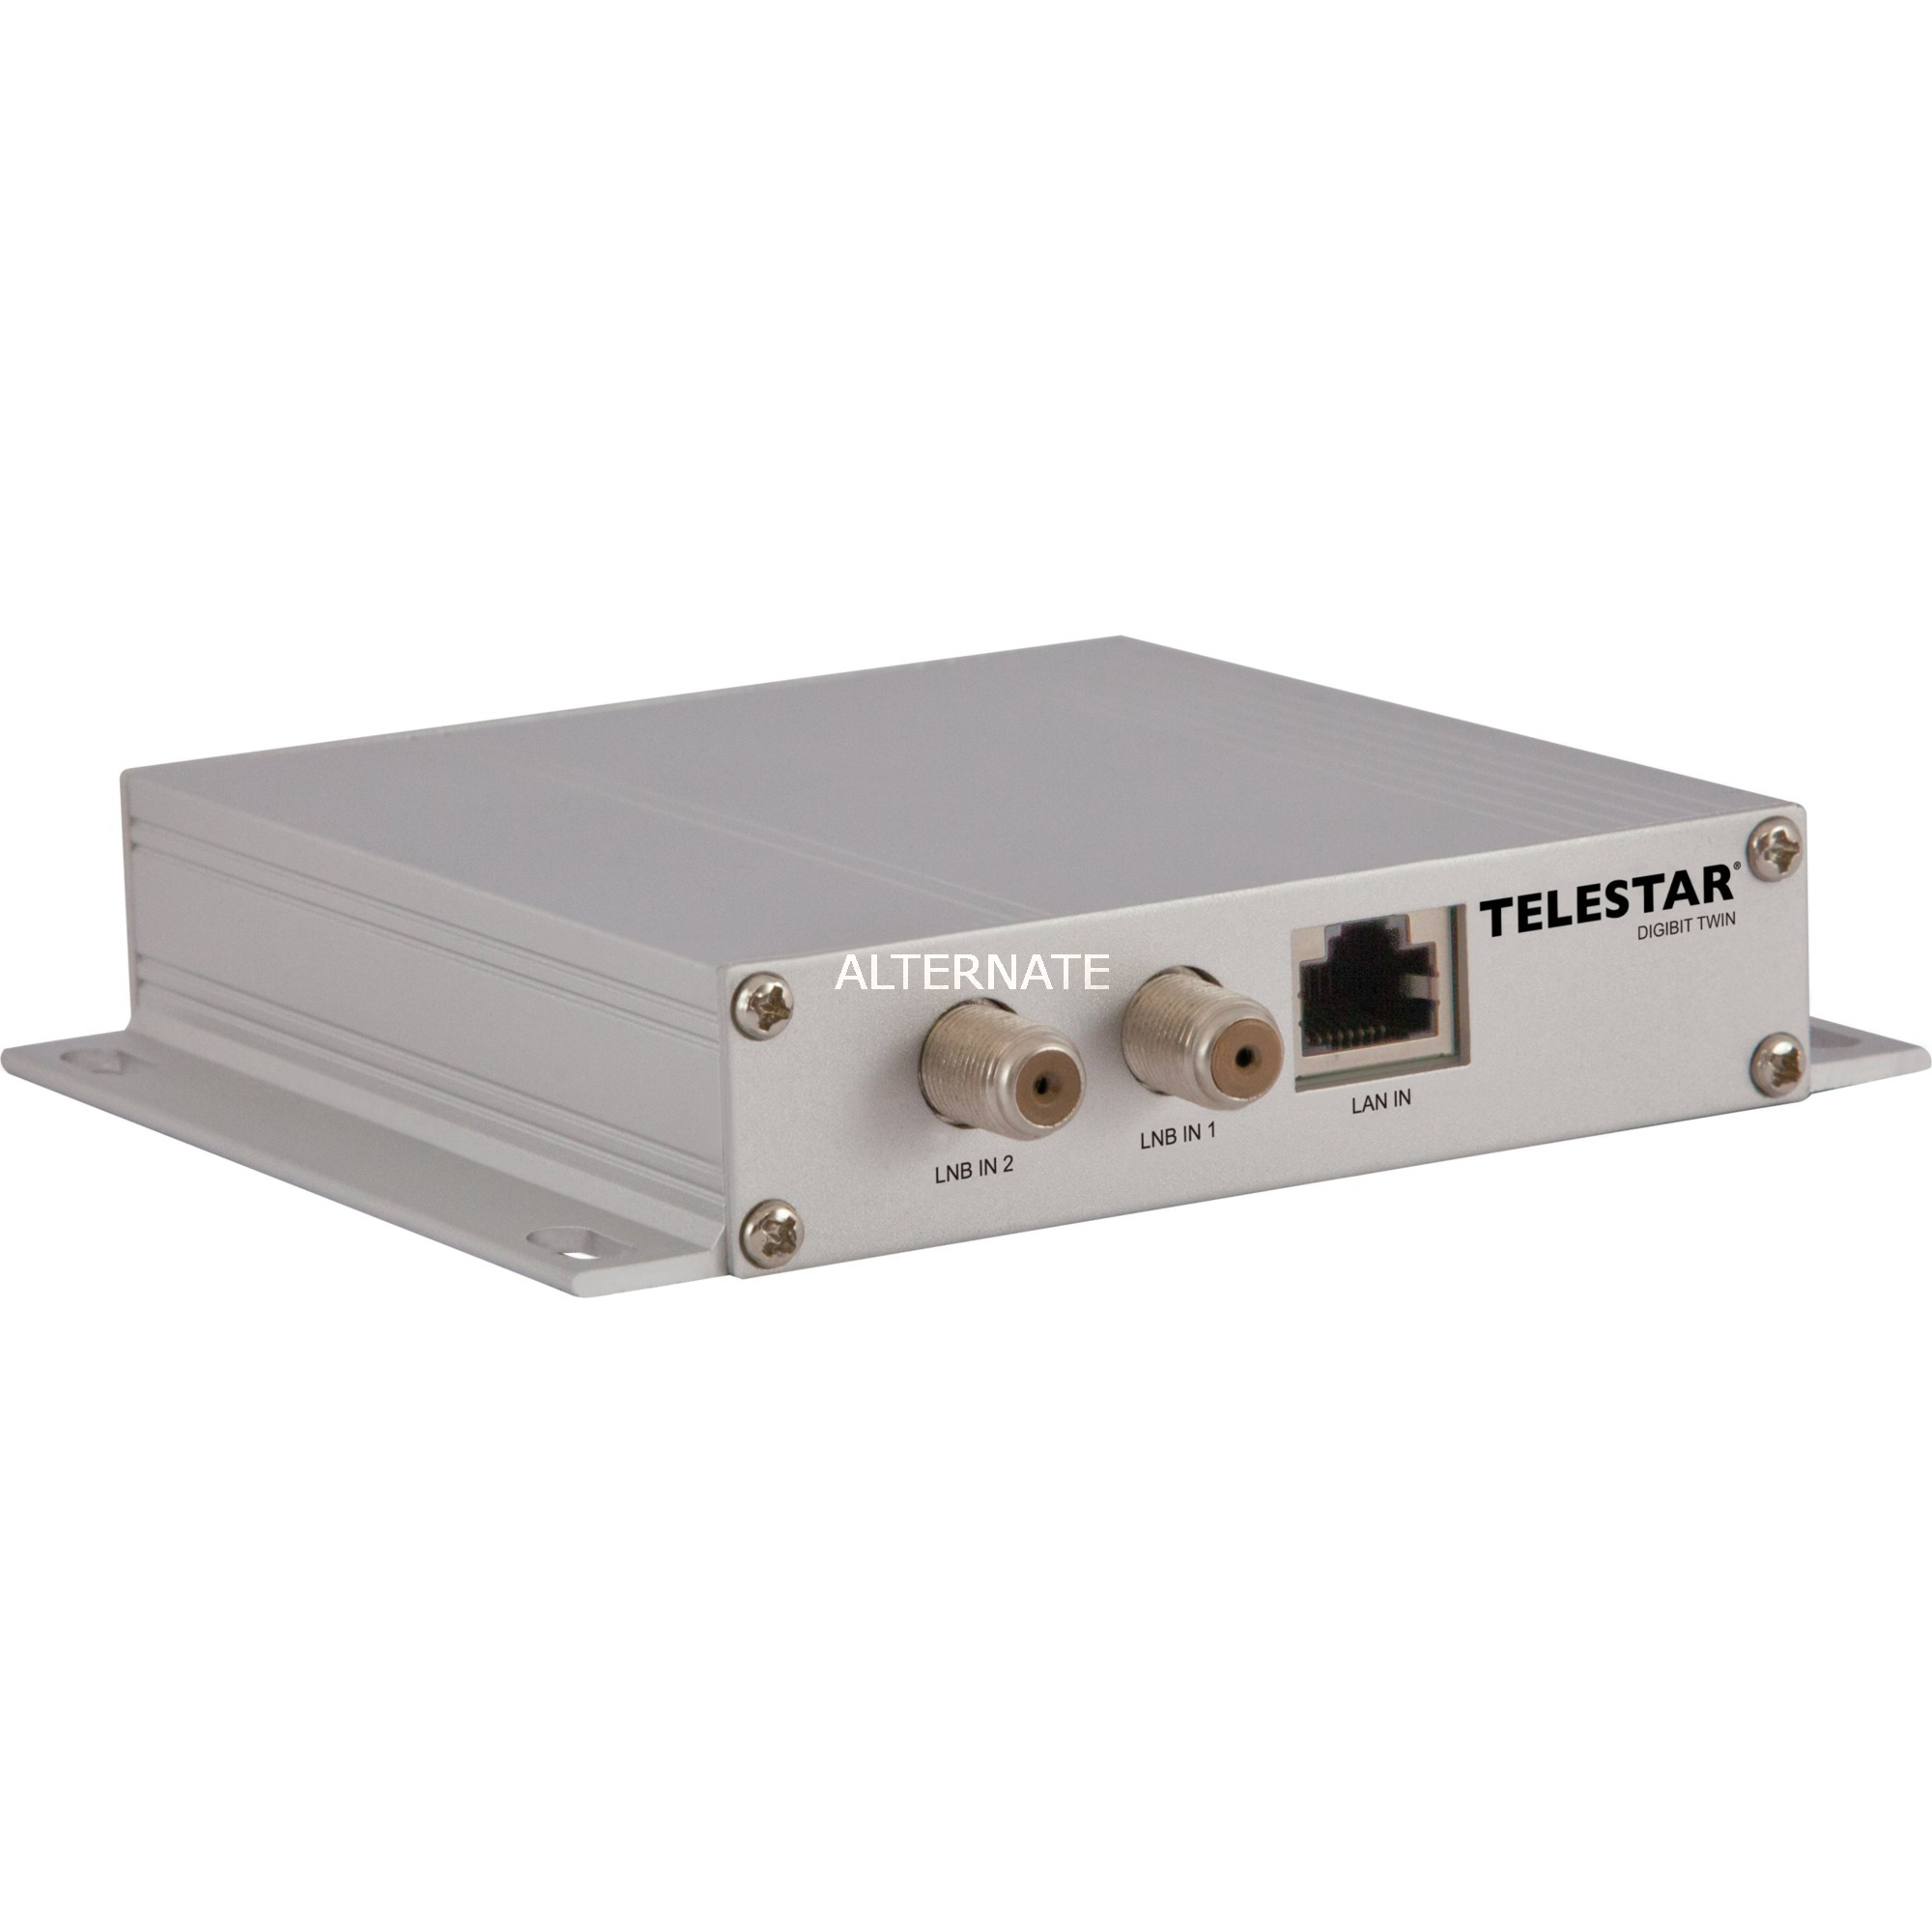 DIGIBIT Twin 1inputs 2outputs conmutador múltiple para satélite, Transmisor